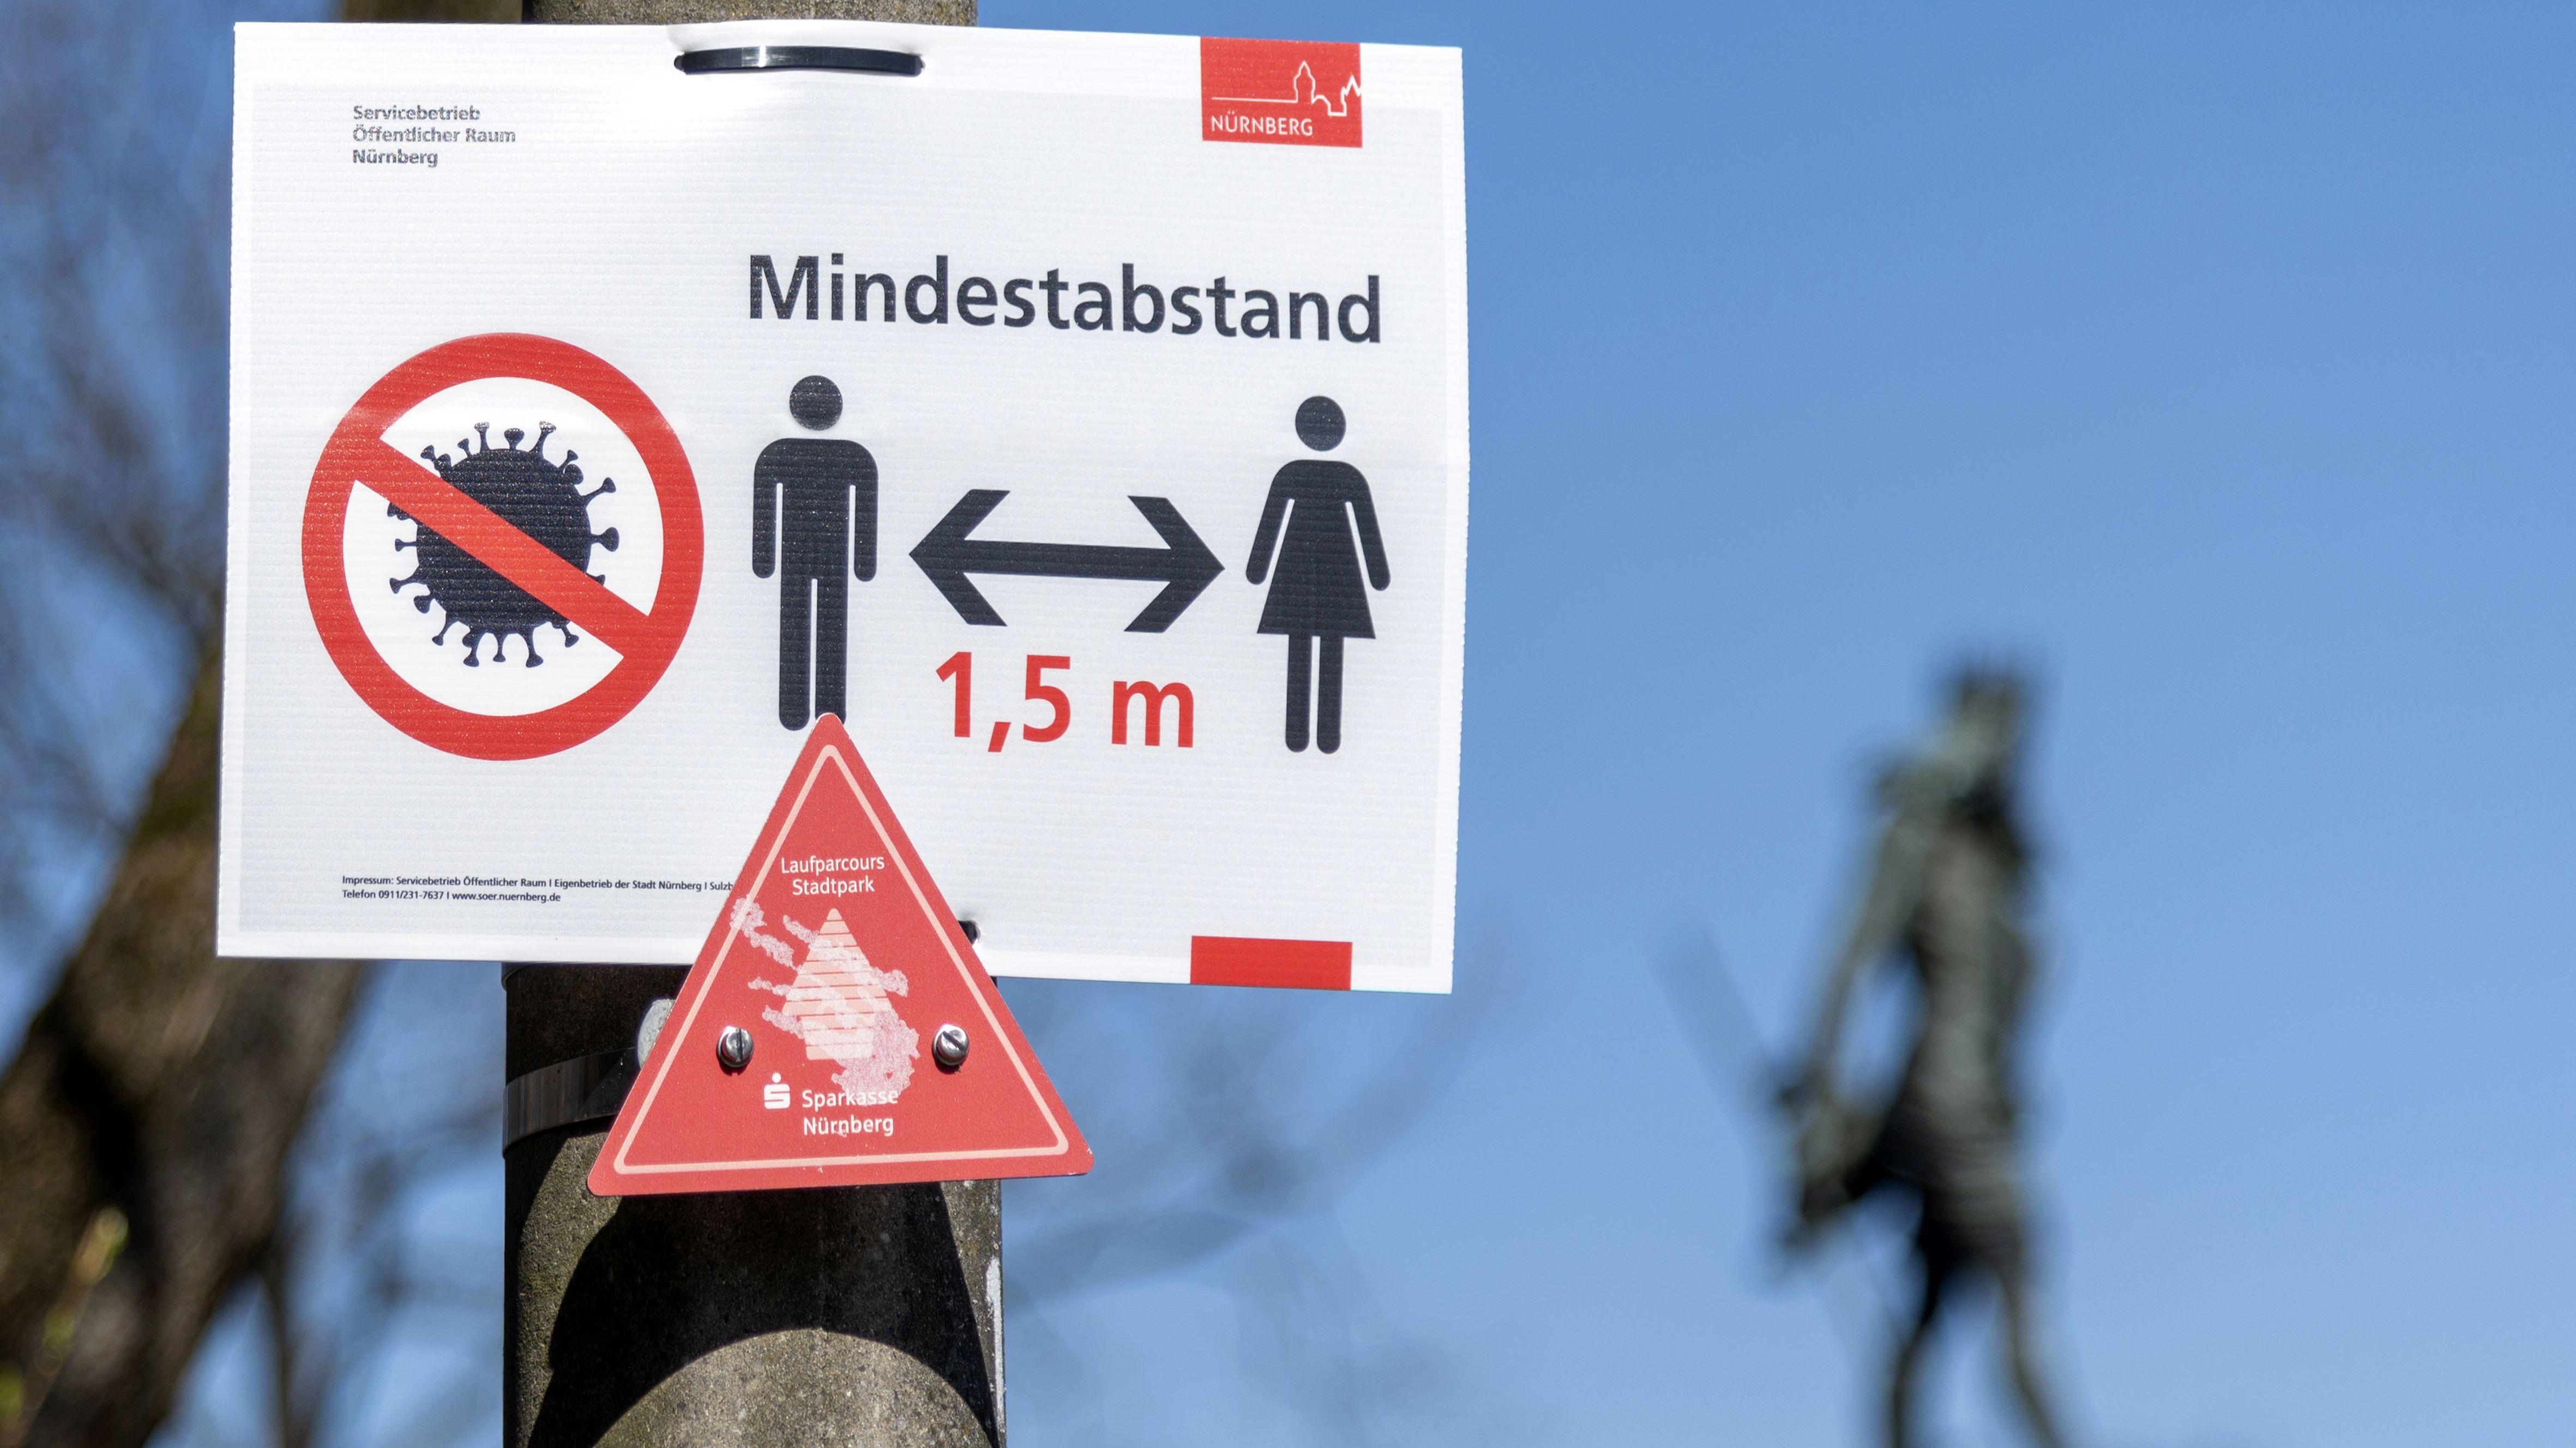 Hinweisschild zum Mindestabstand wegen der Coronakrise im Stadtpark. Nürnberg,